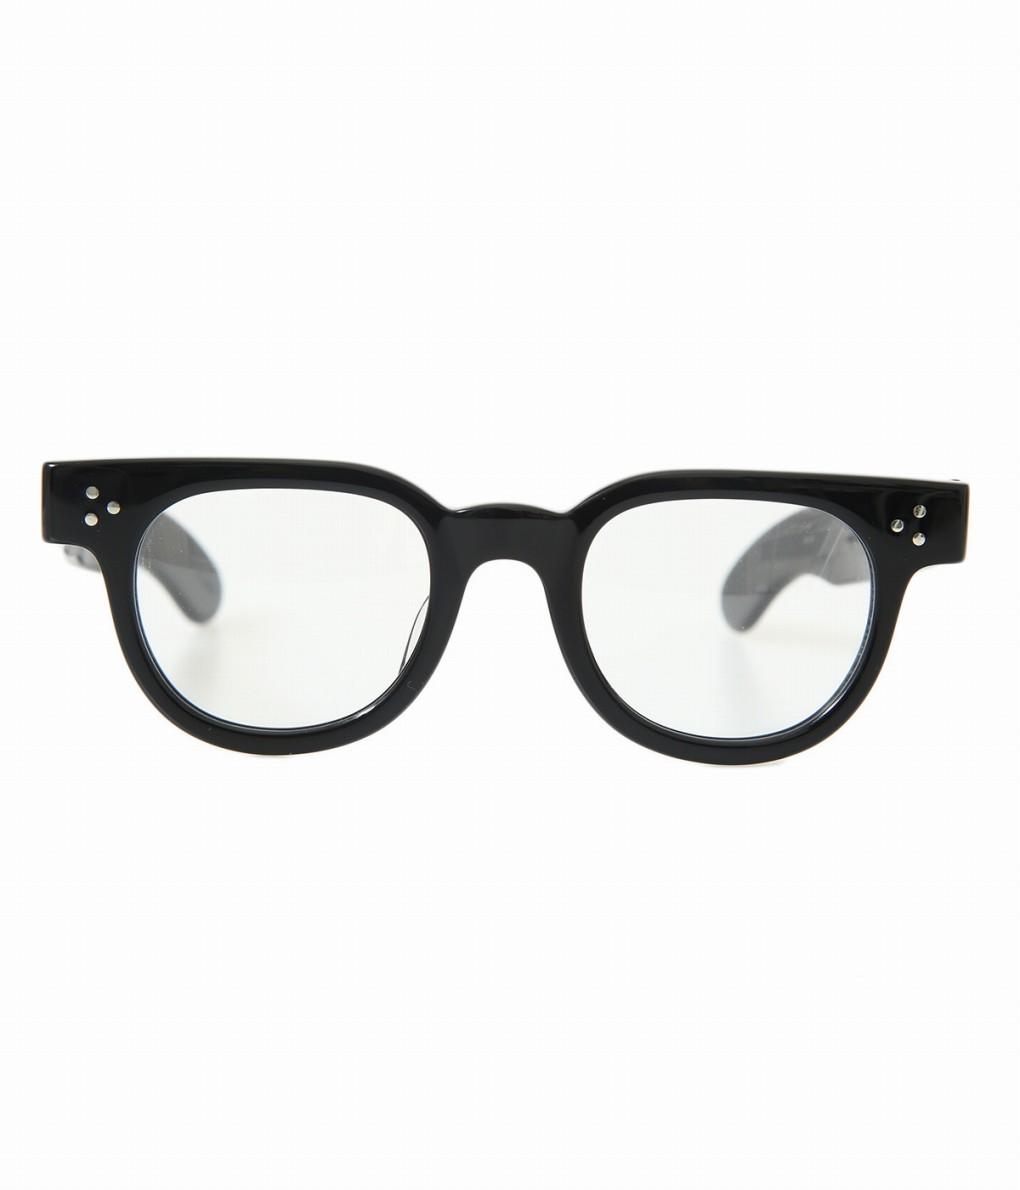 JULIUS TART OPTICAL / ジュリアスタートオプティカル : FDR 44(size) 46(size) 48(size) -BLACK / CLEAR - : サングラス アクセサリー メガネ 眼鏡 メンズ : JTPL-013A-005A-006A【WIS】【COR】